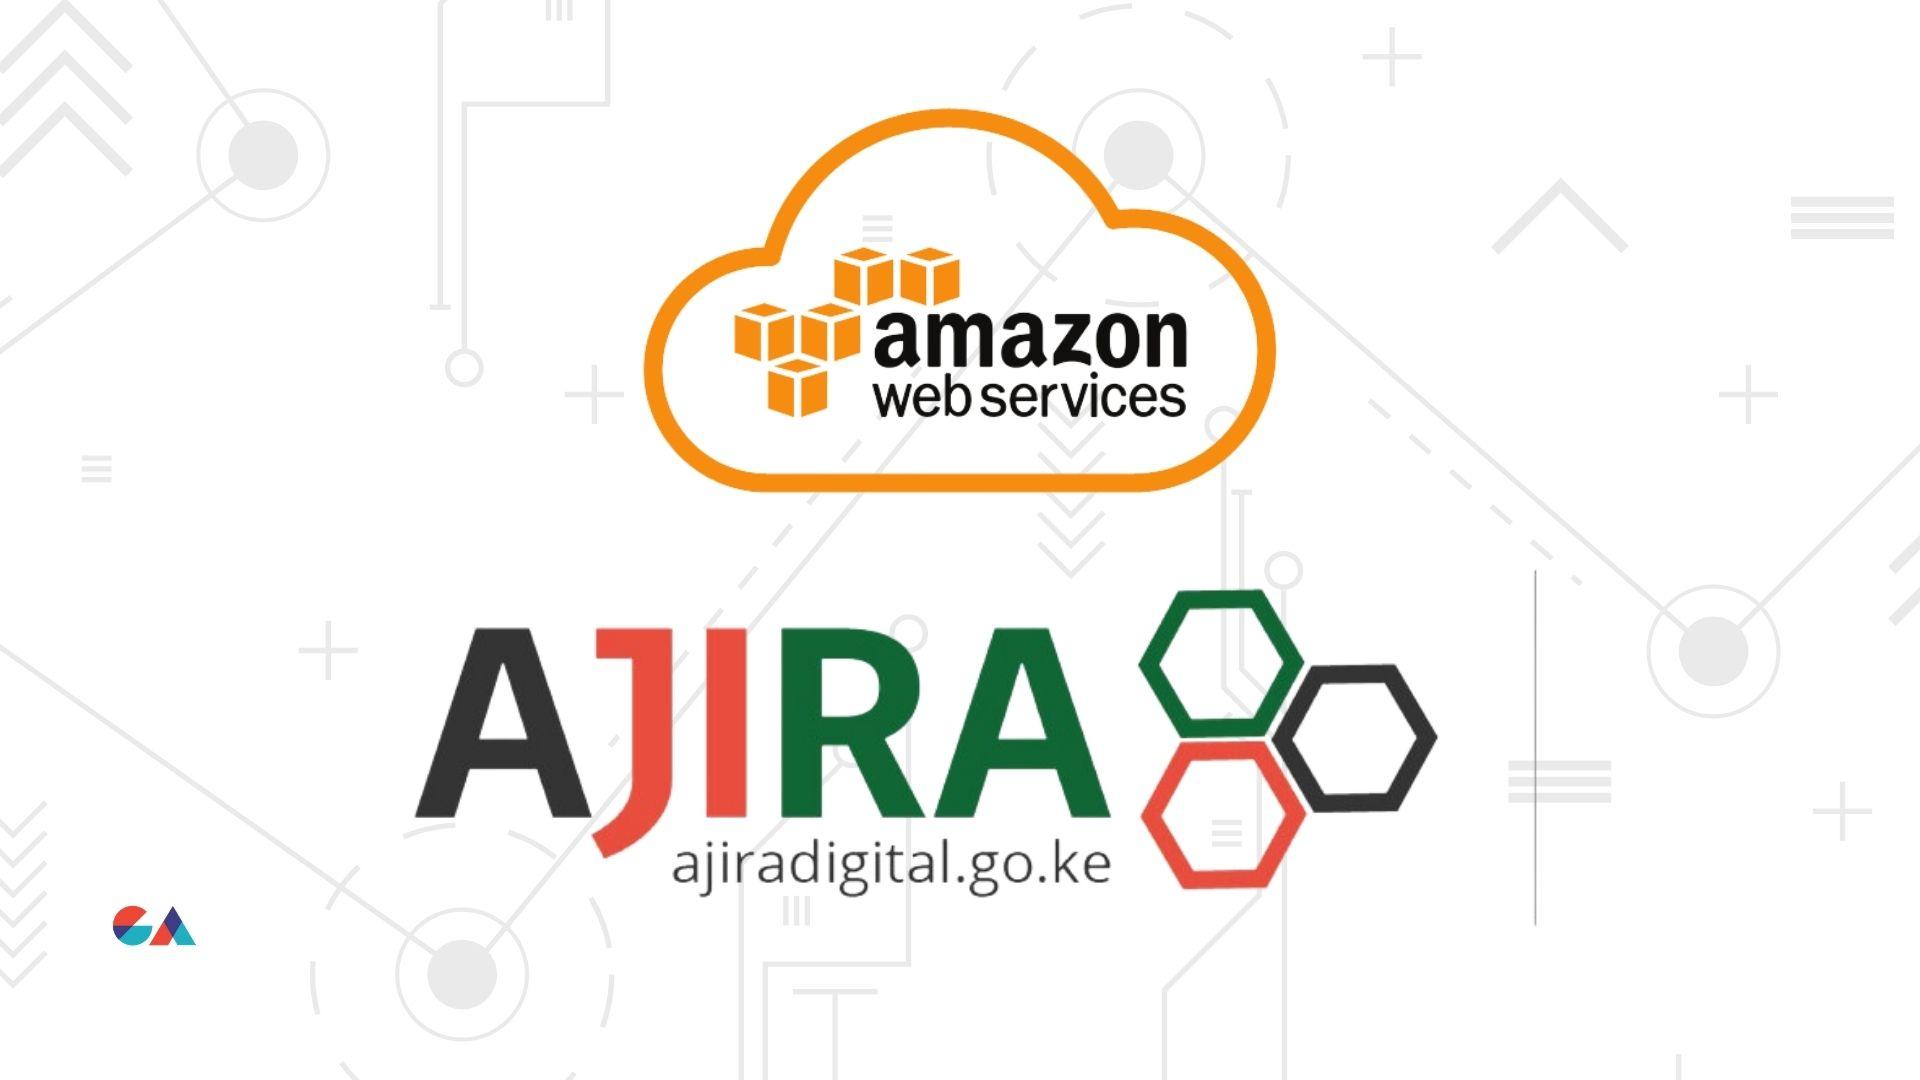 Amazon and Ajira Partnership Offers Kenyans Free Cloud Computing Training